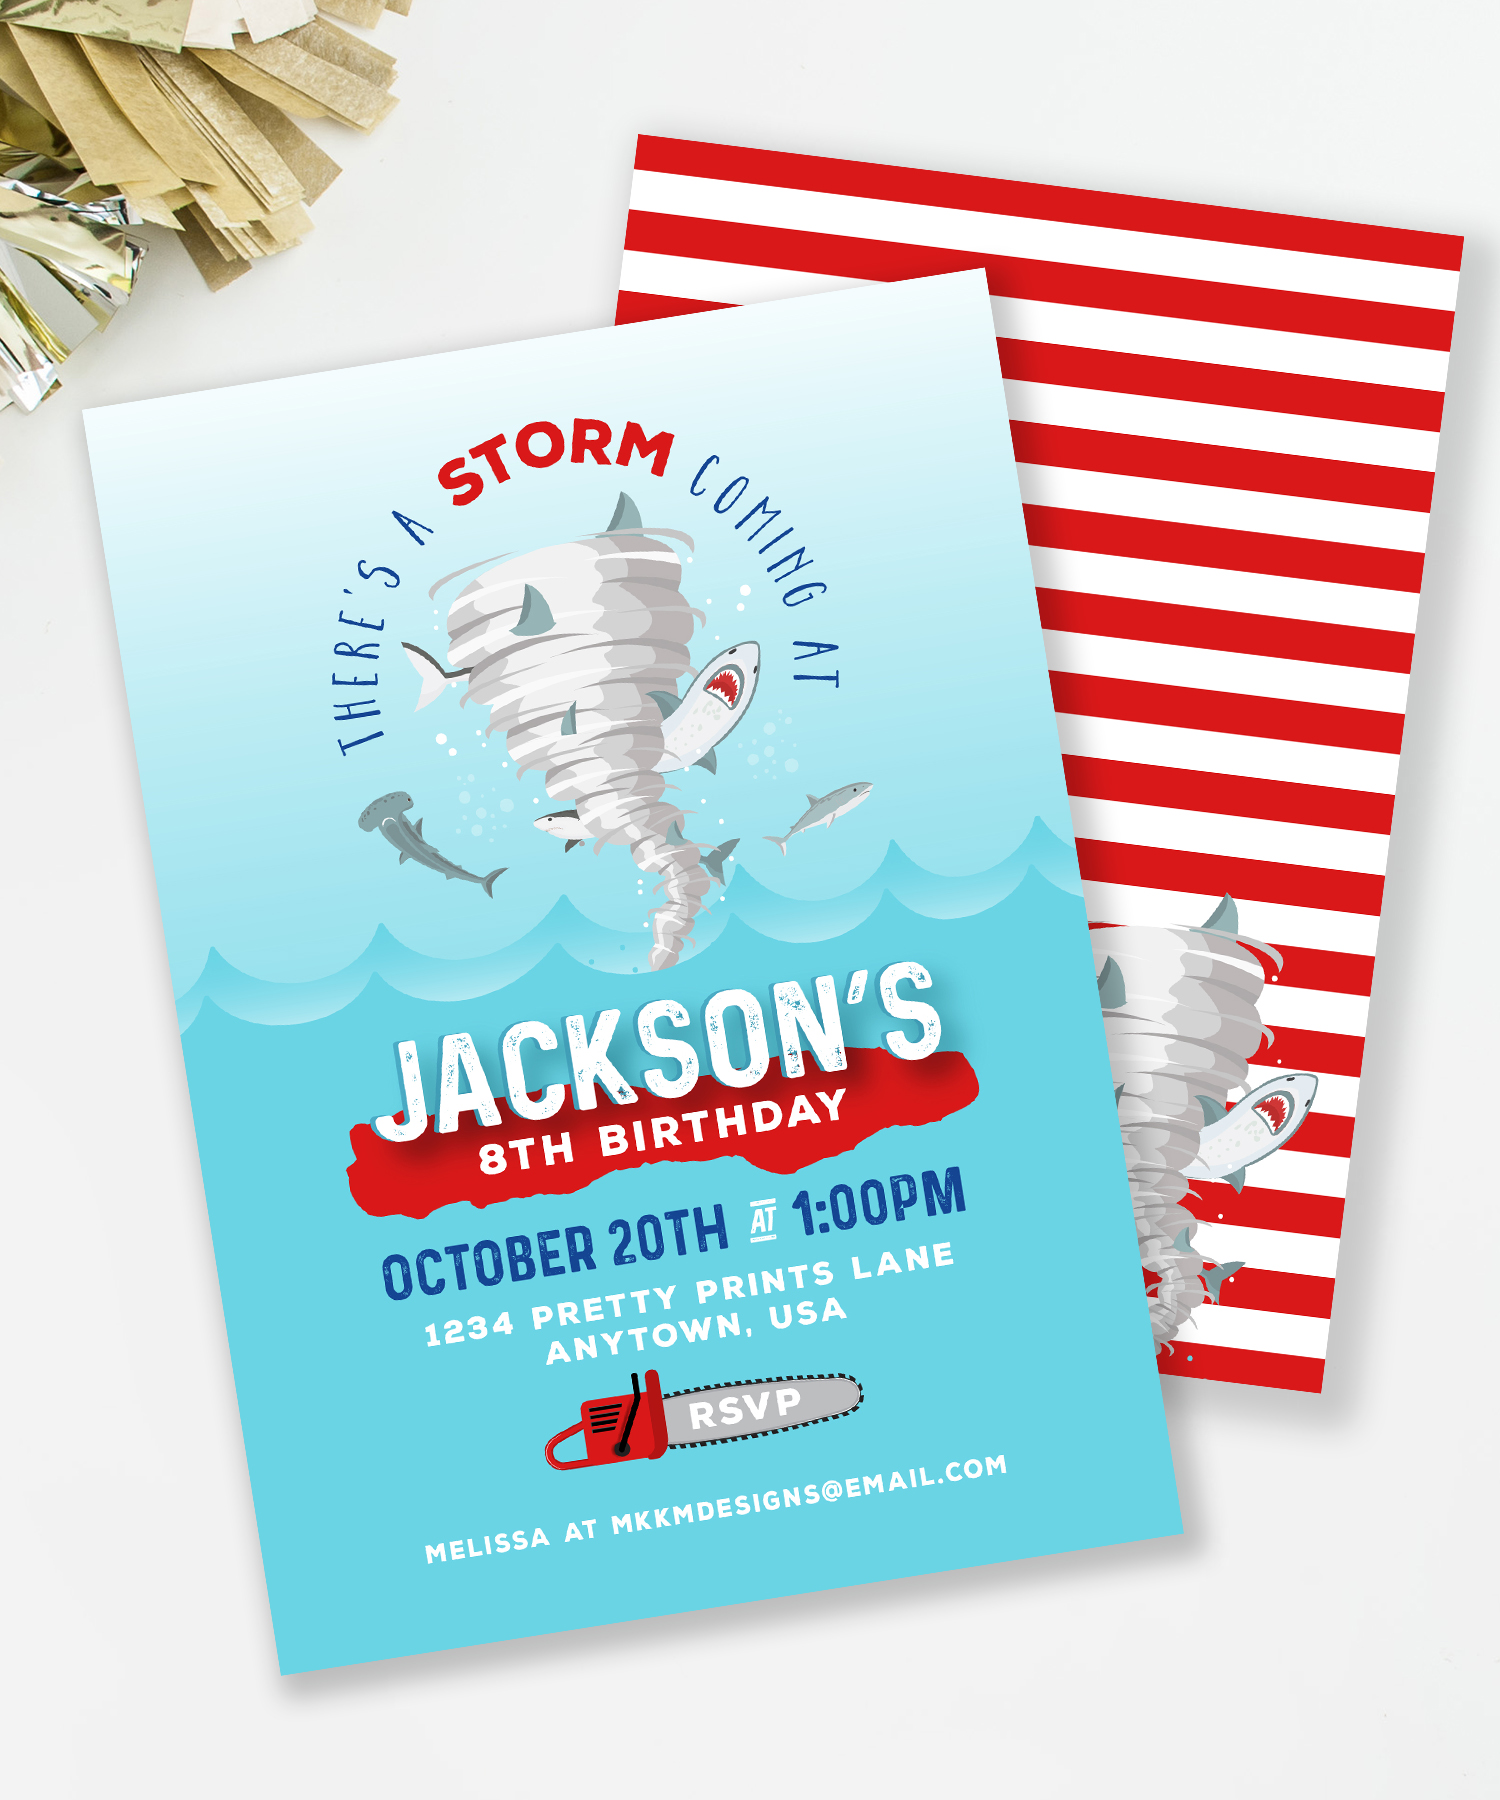 Sharknado Birthday Party Invitation // Shark Birthday Party Invite // MKKM Designs